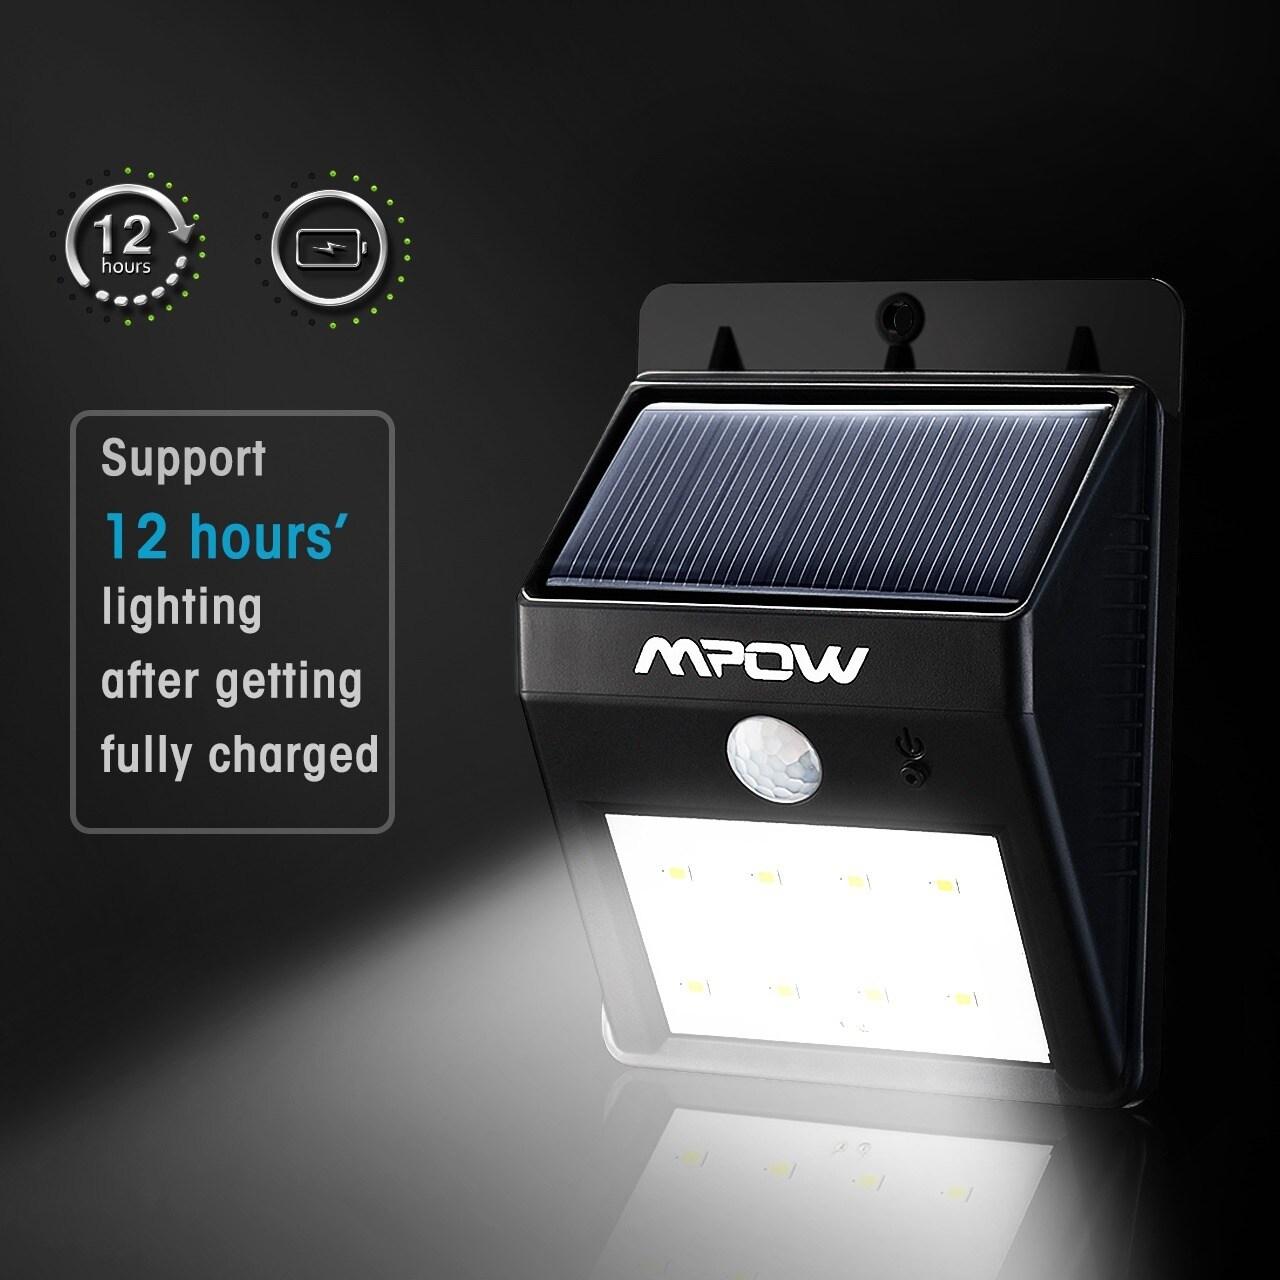 Mpow solar powered wireless outdoor motion sensor light free mpow solar powered wireless outdoor motion sensor light free shipping on orders over 45 overstock 18974309 aloadofball Choice Image